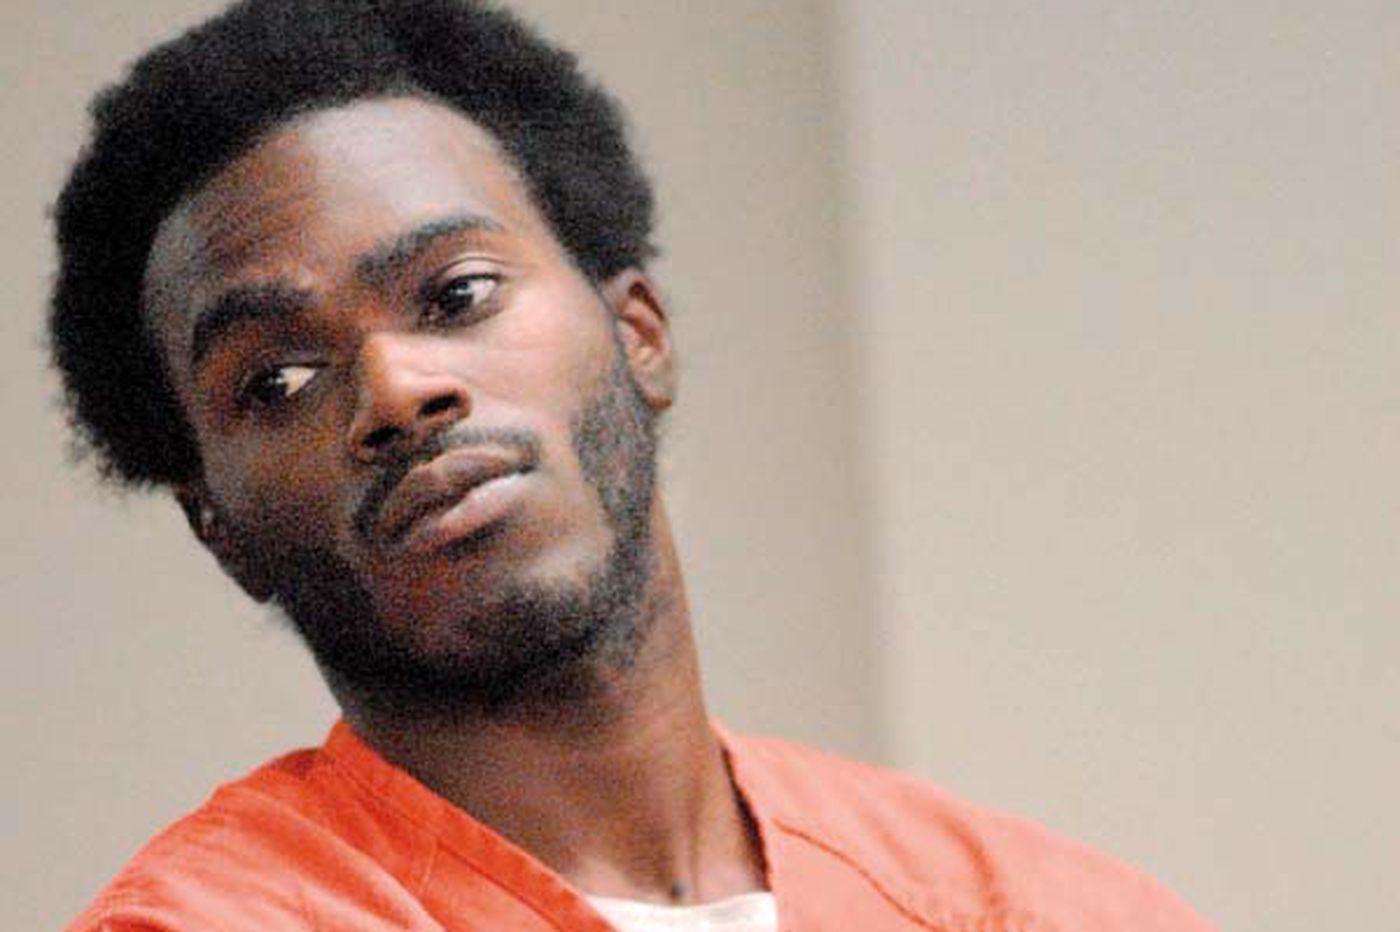 Killer gets tough lesson in plea deal arithmetic